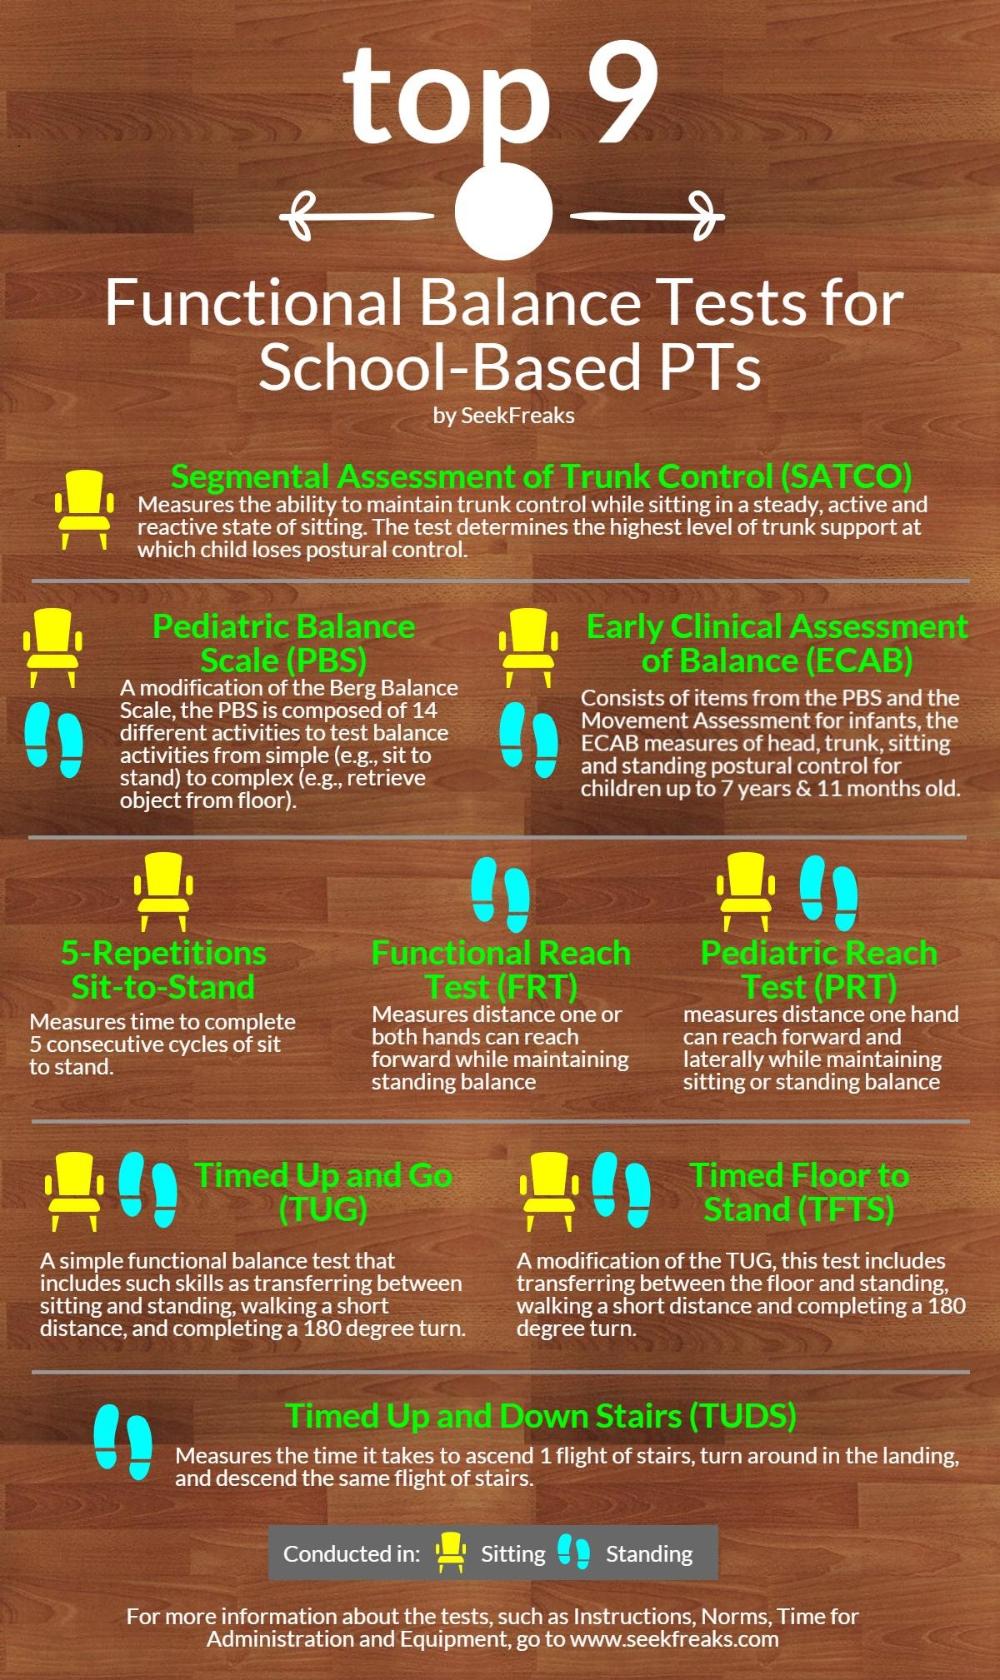 Top 9 Functional Balance Tests for School-Based PTs | SeekFreaks